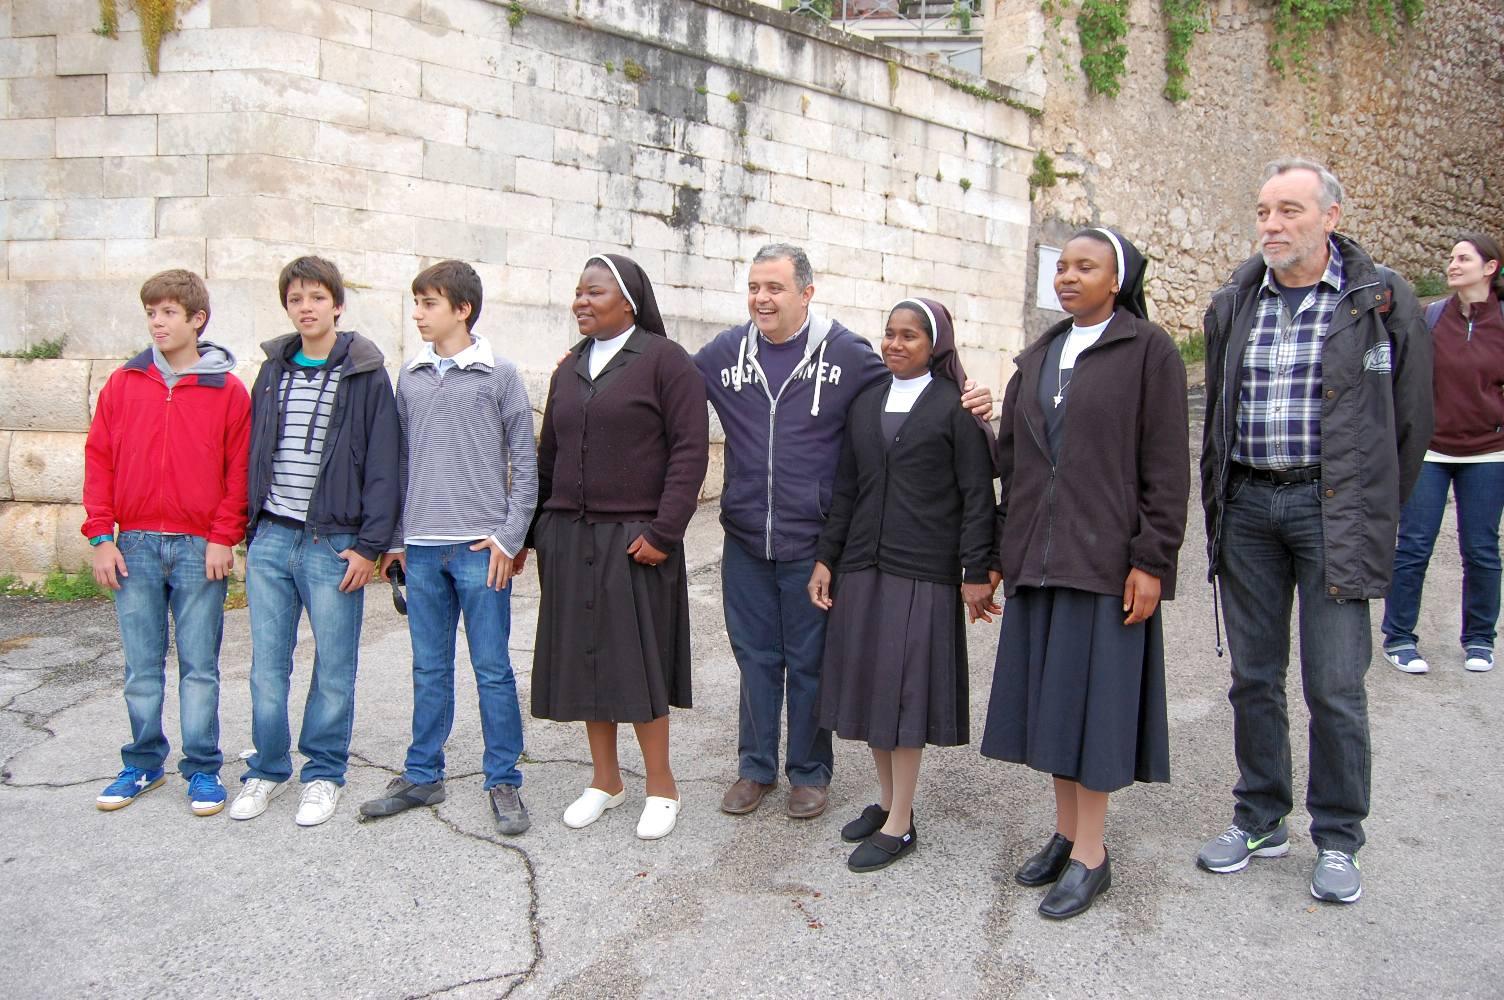 beatificacion_JPII_01_05_2011_027